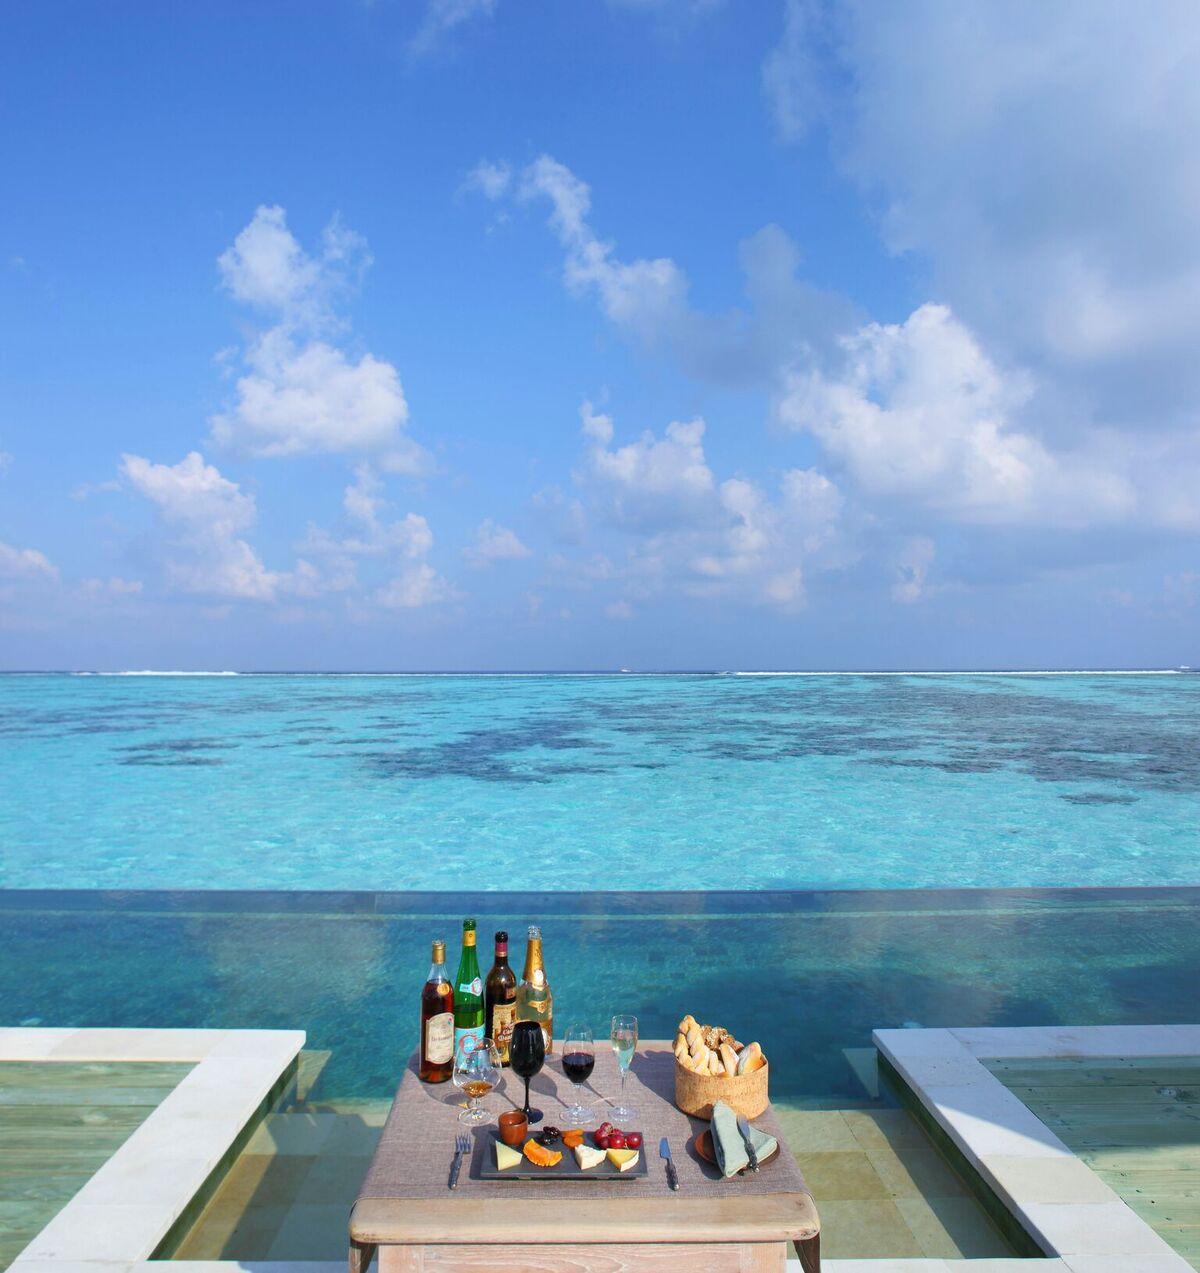 Private Reserve Beverage Tasting at Infinity Pool